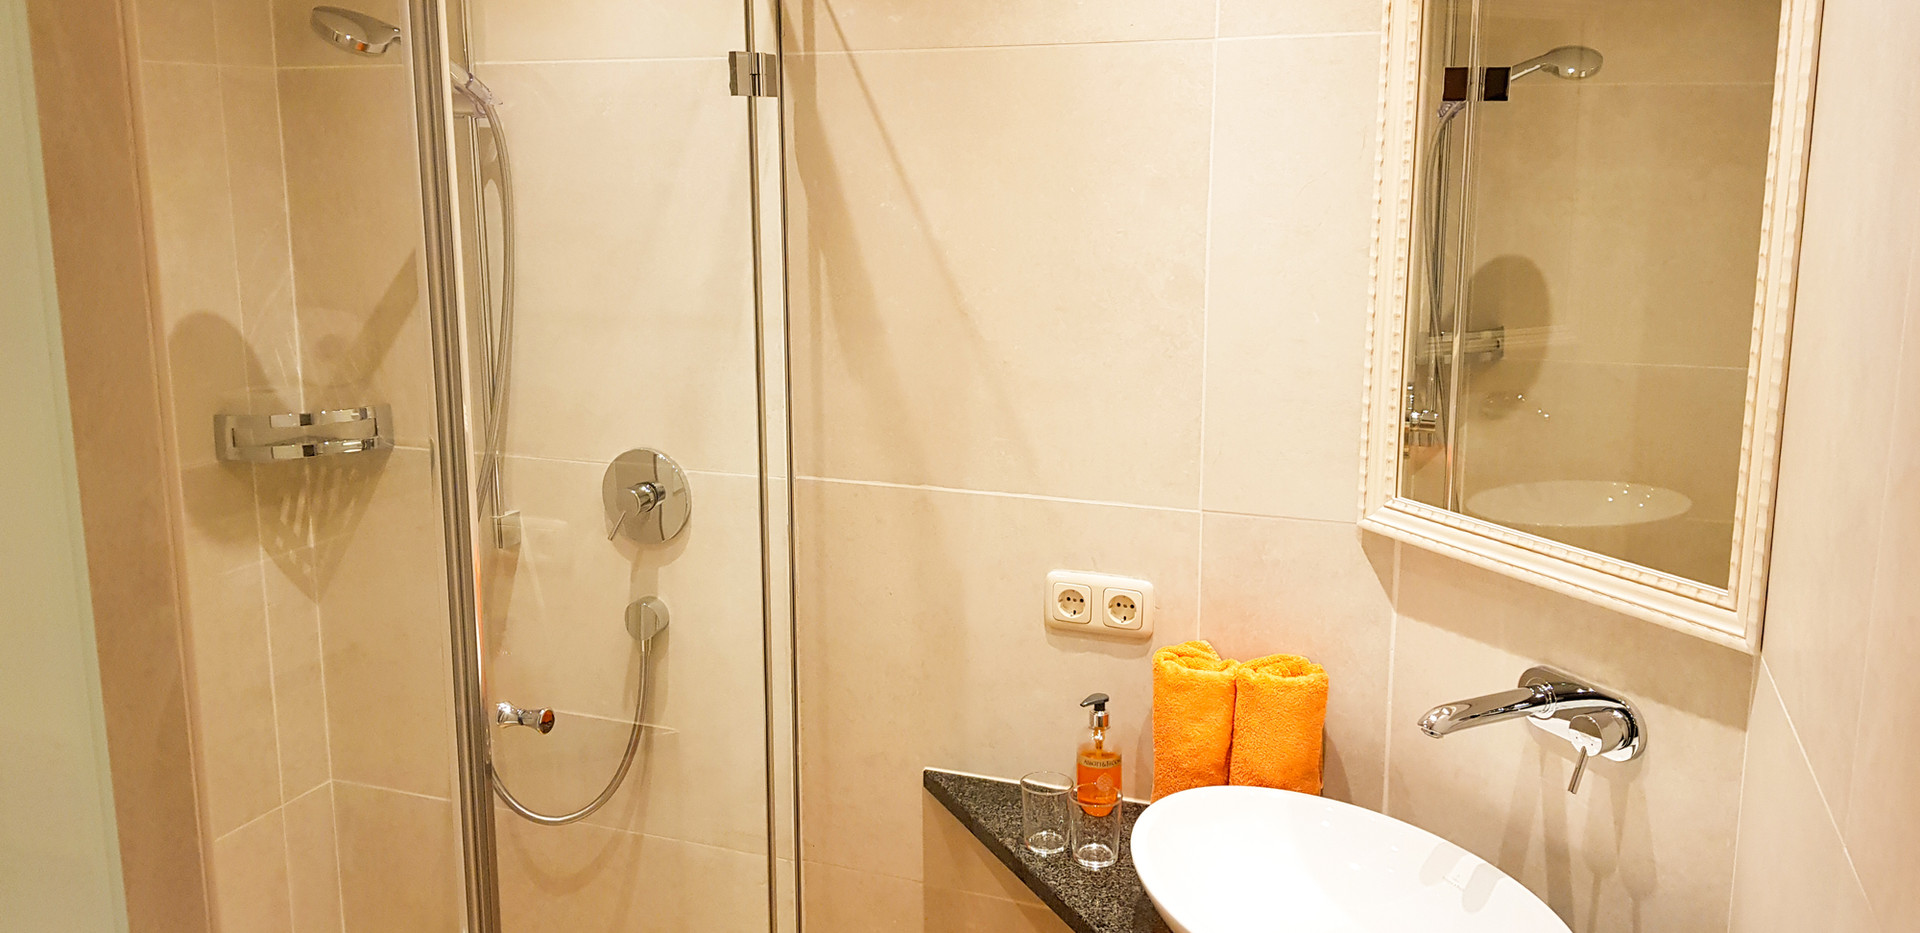 Greti's Badezimmer